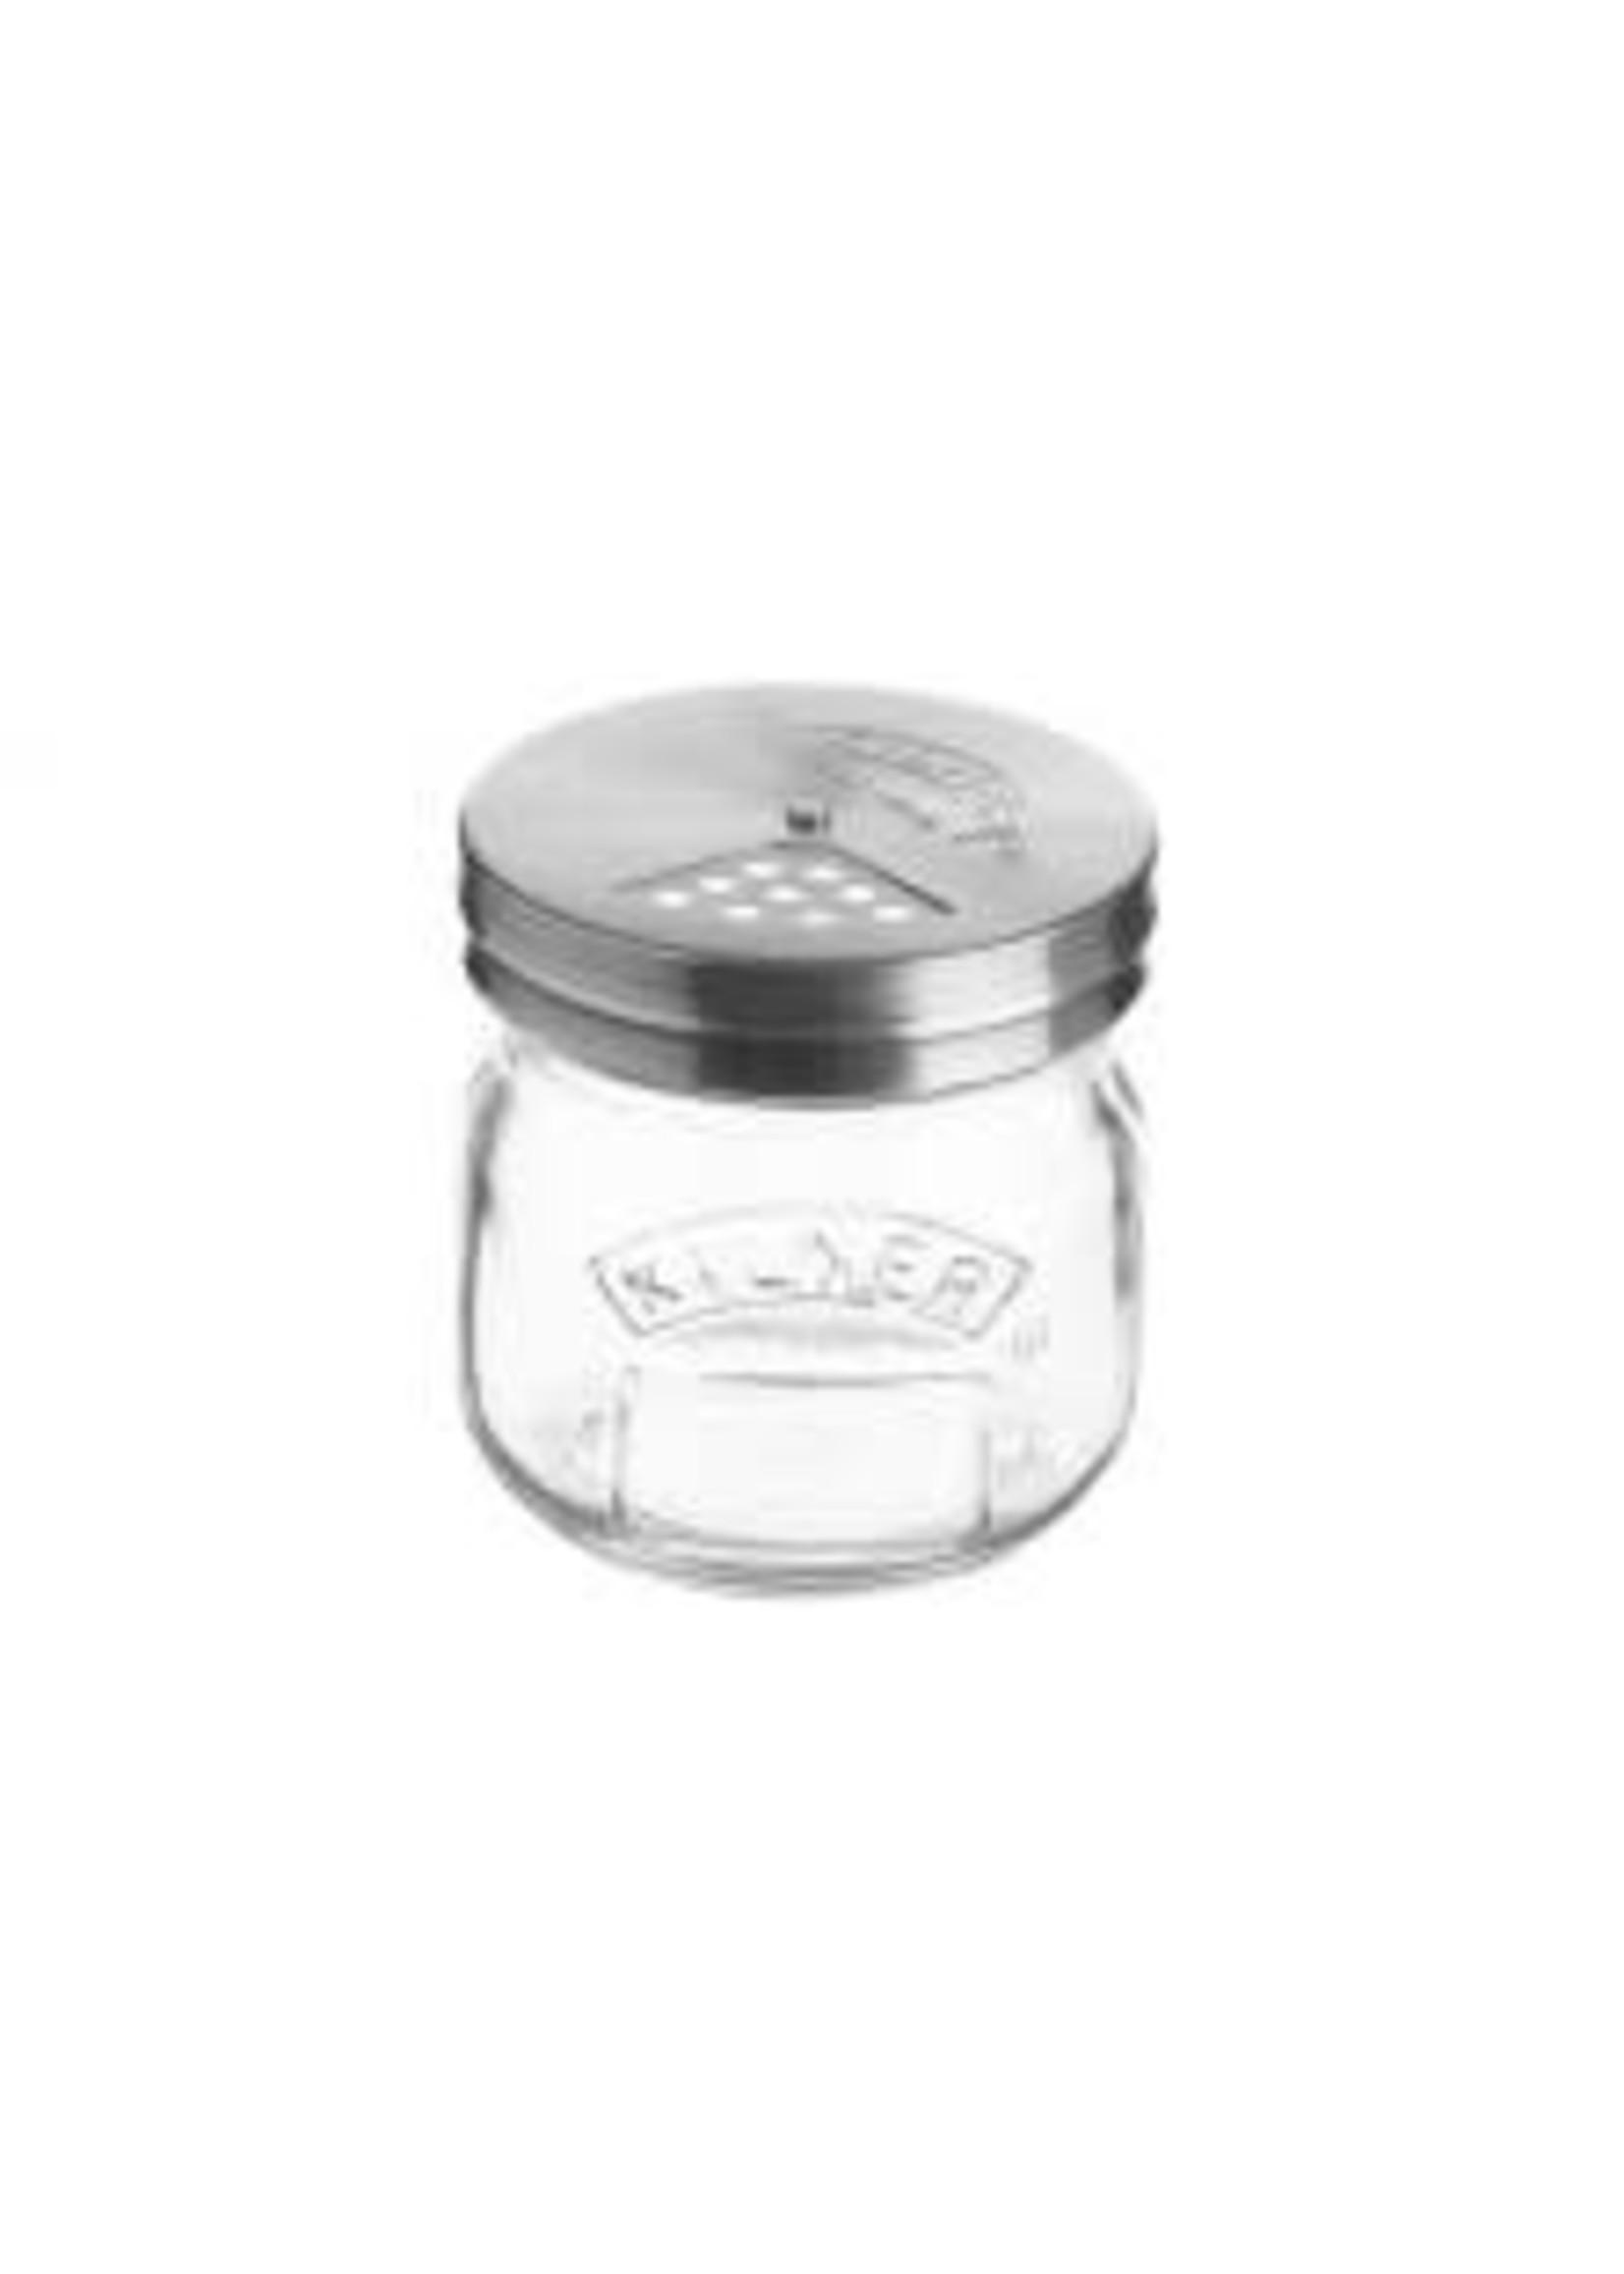 Typhoone Storage jar and shaker lid